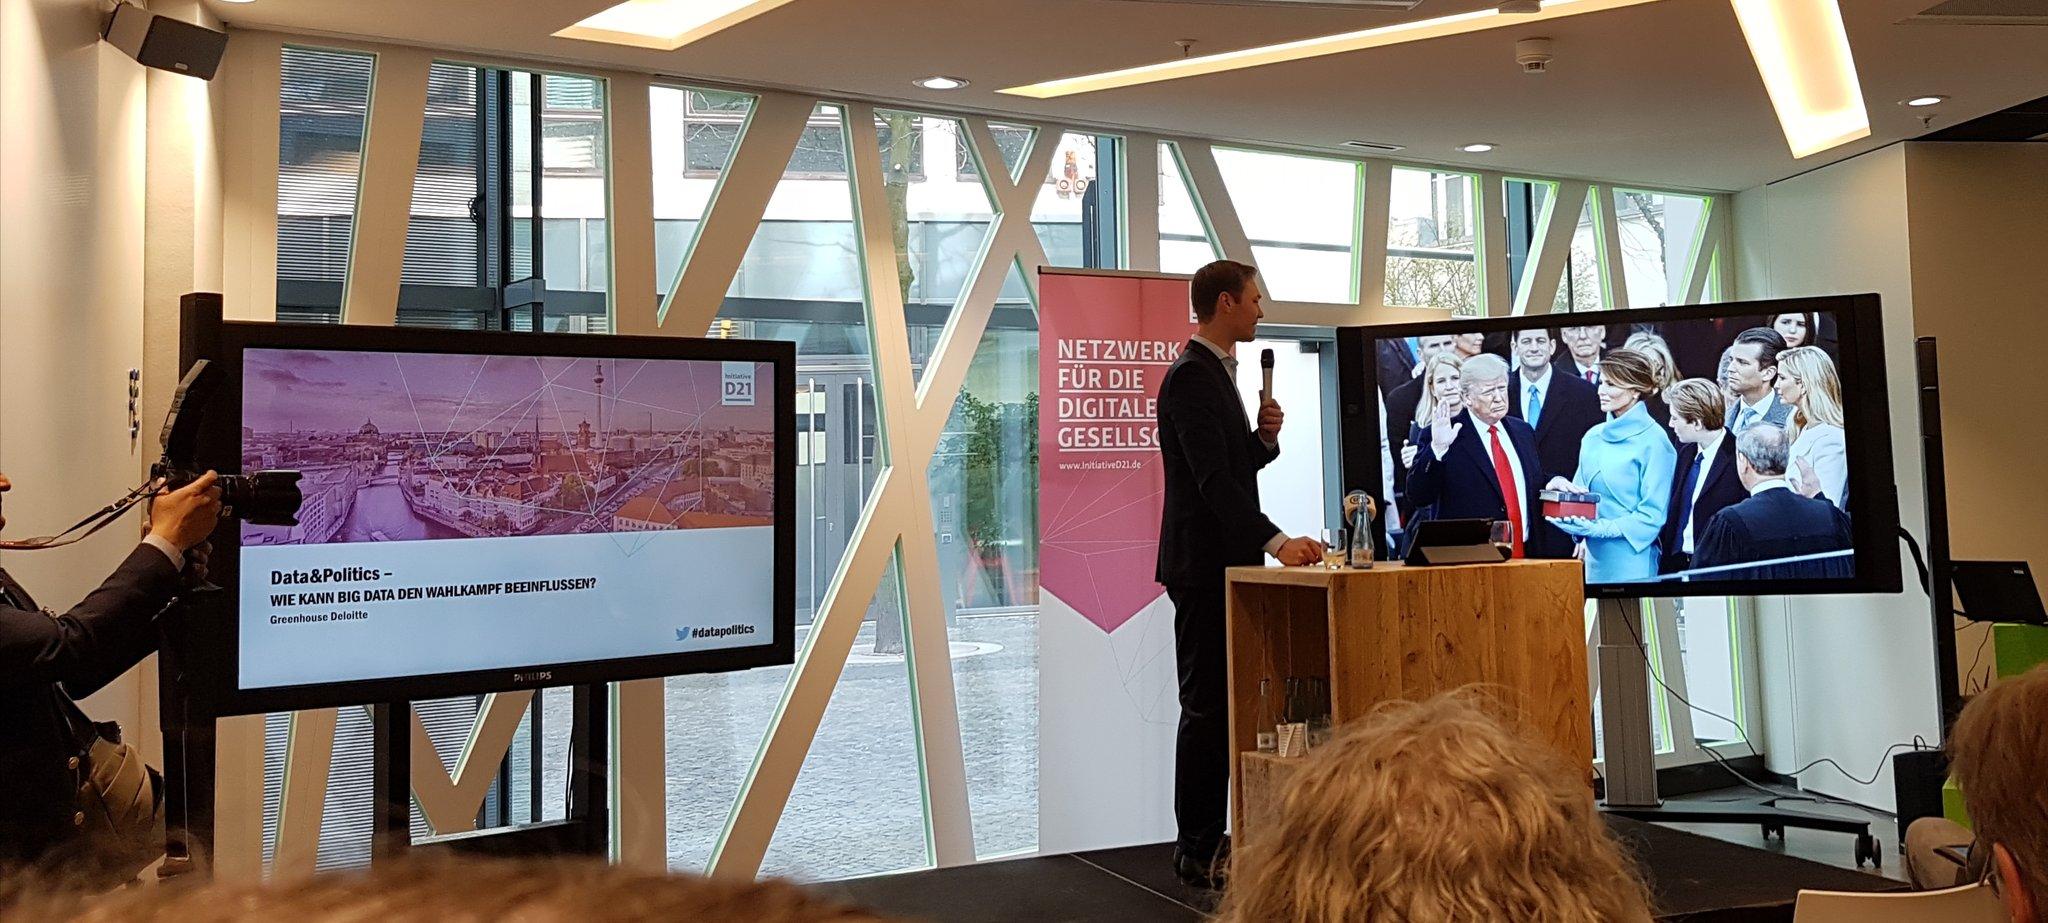 #datapolitics: @juliusvandelaar über Big Data, Ethik und Social Media im US-Wahlkampf. https://t.co/w9MruJQlsh